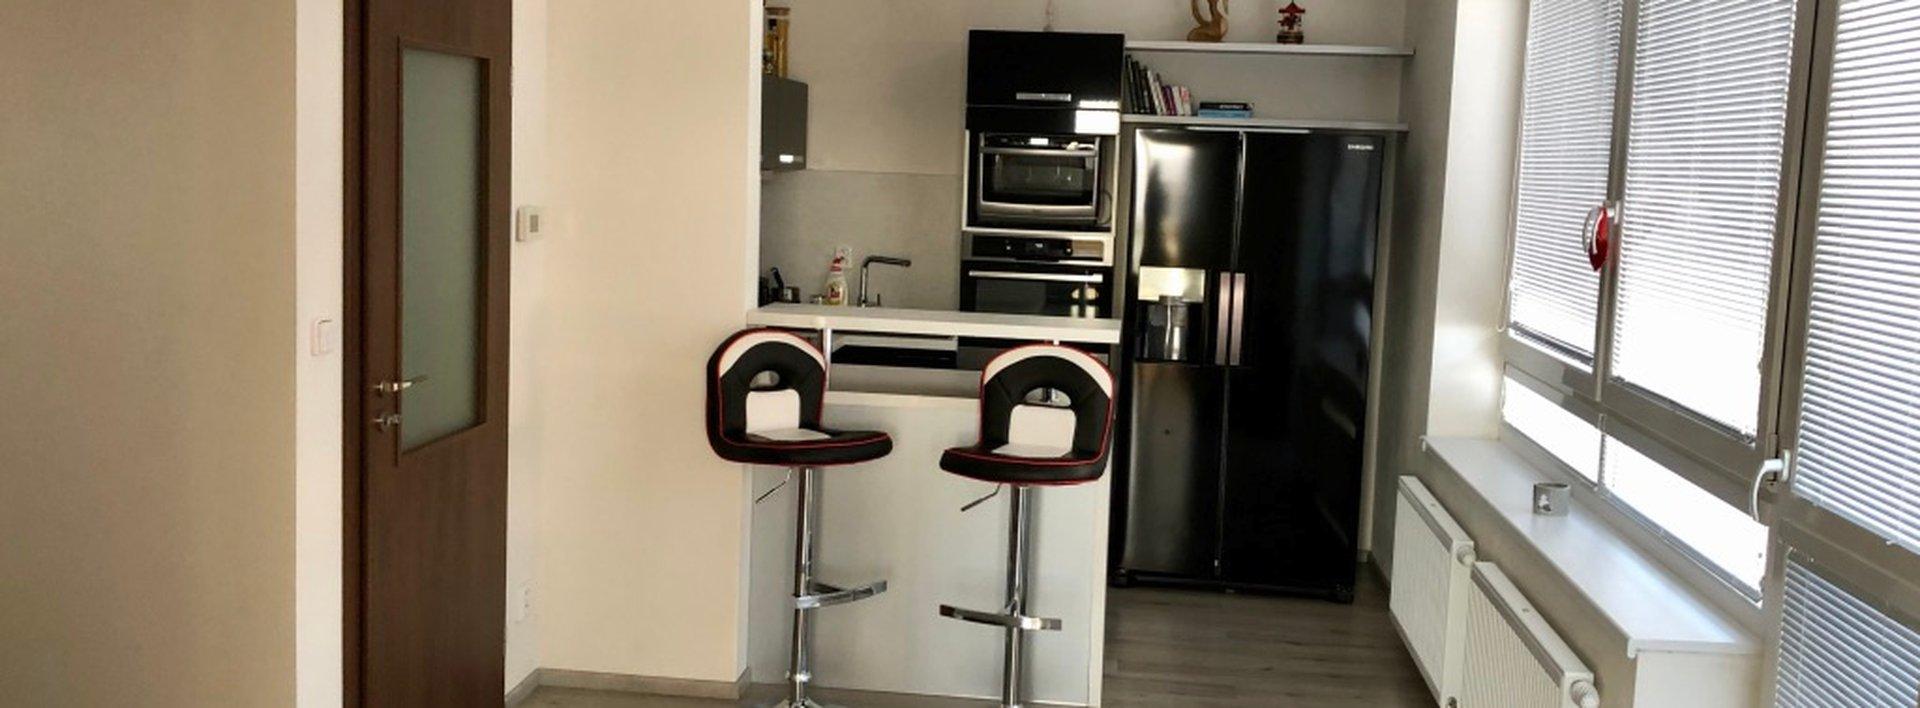 Pronájem bytu 2+kk s lodžií, 60 m² - Duhová, Liberec VI, Ev.č.: N49376